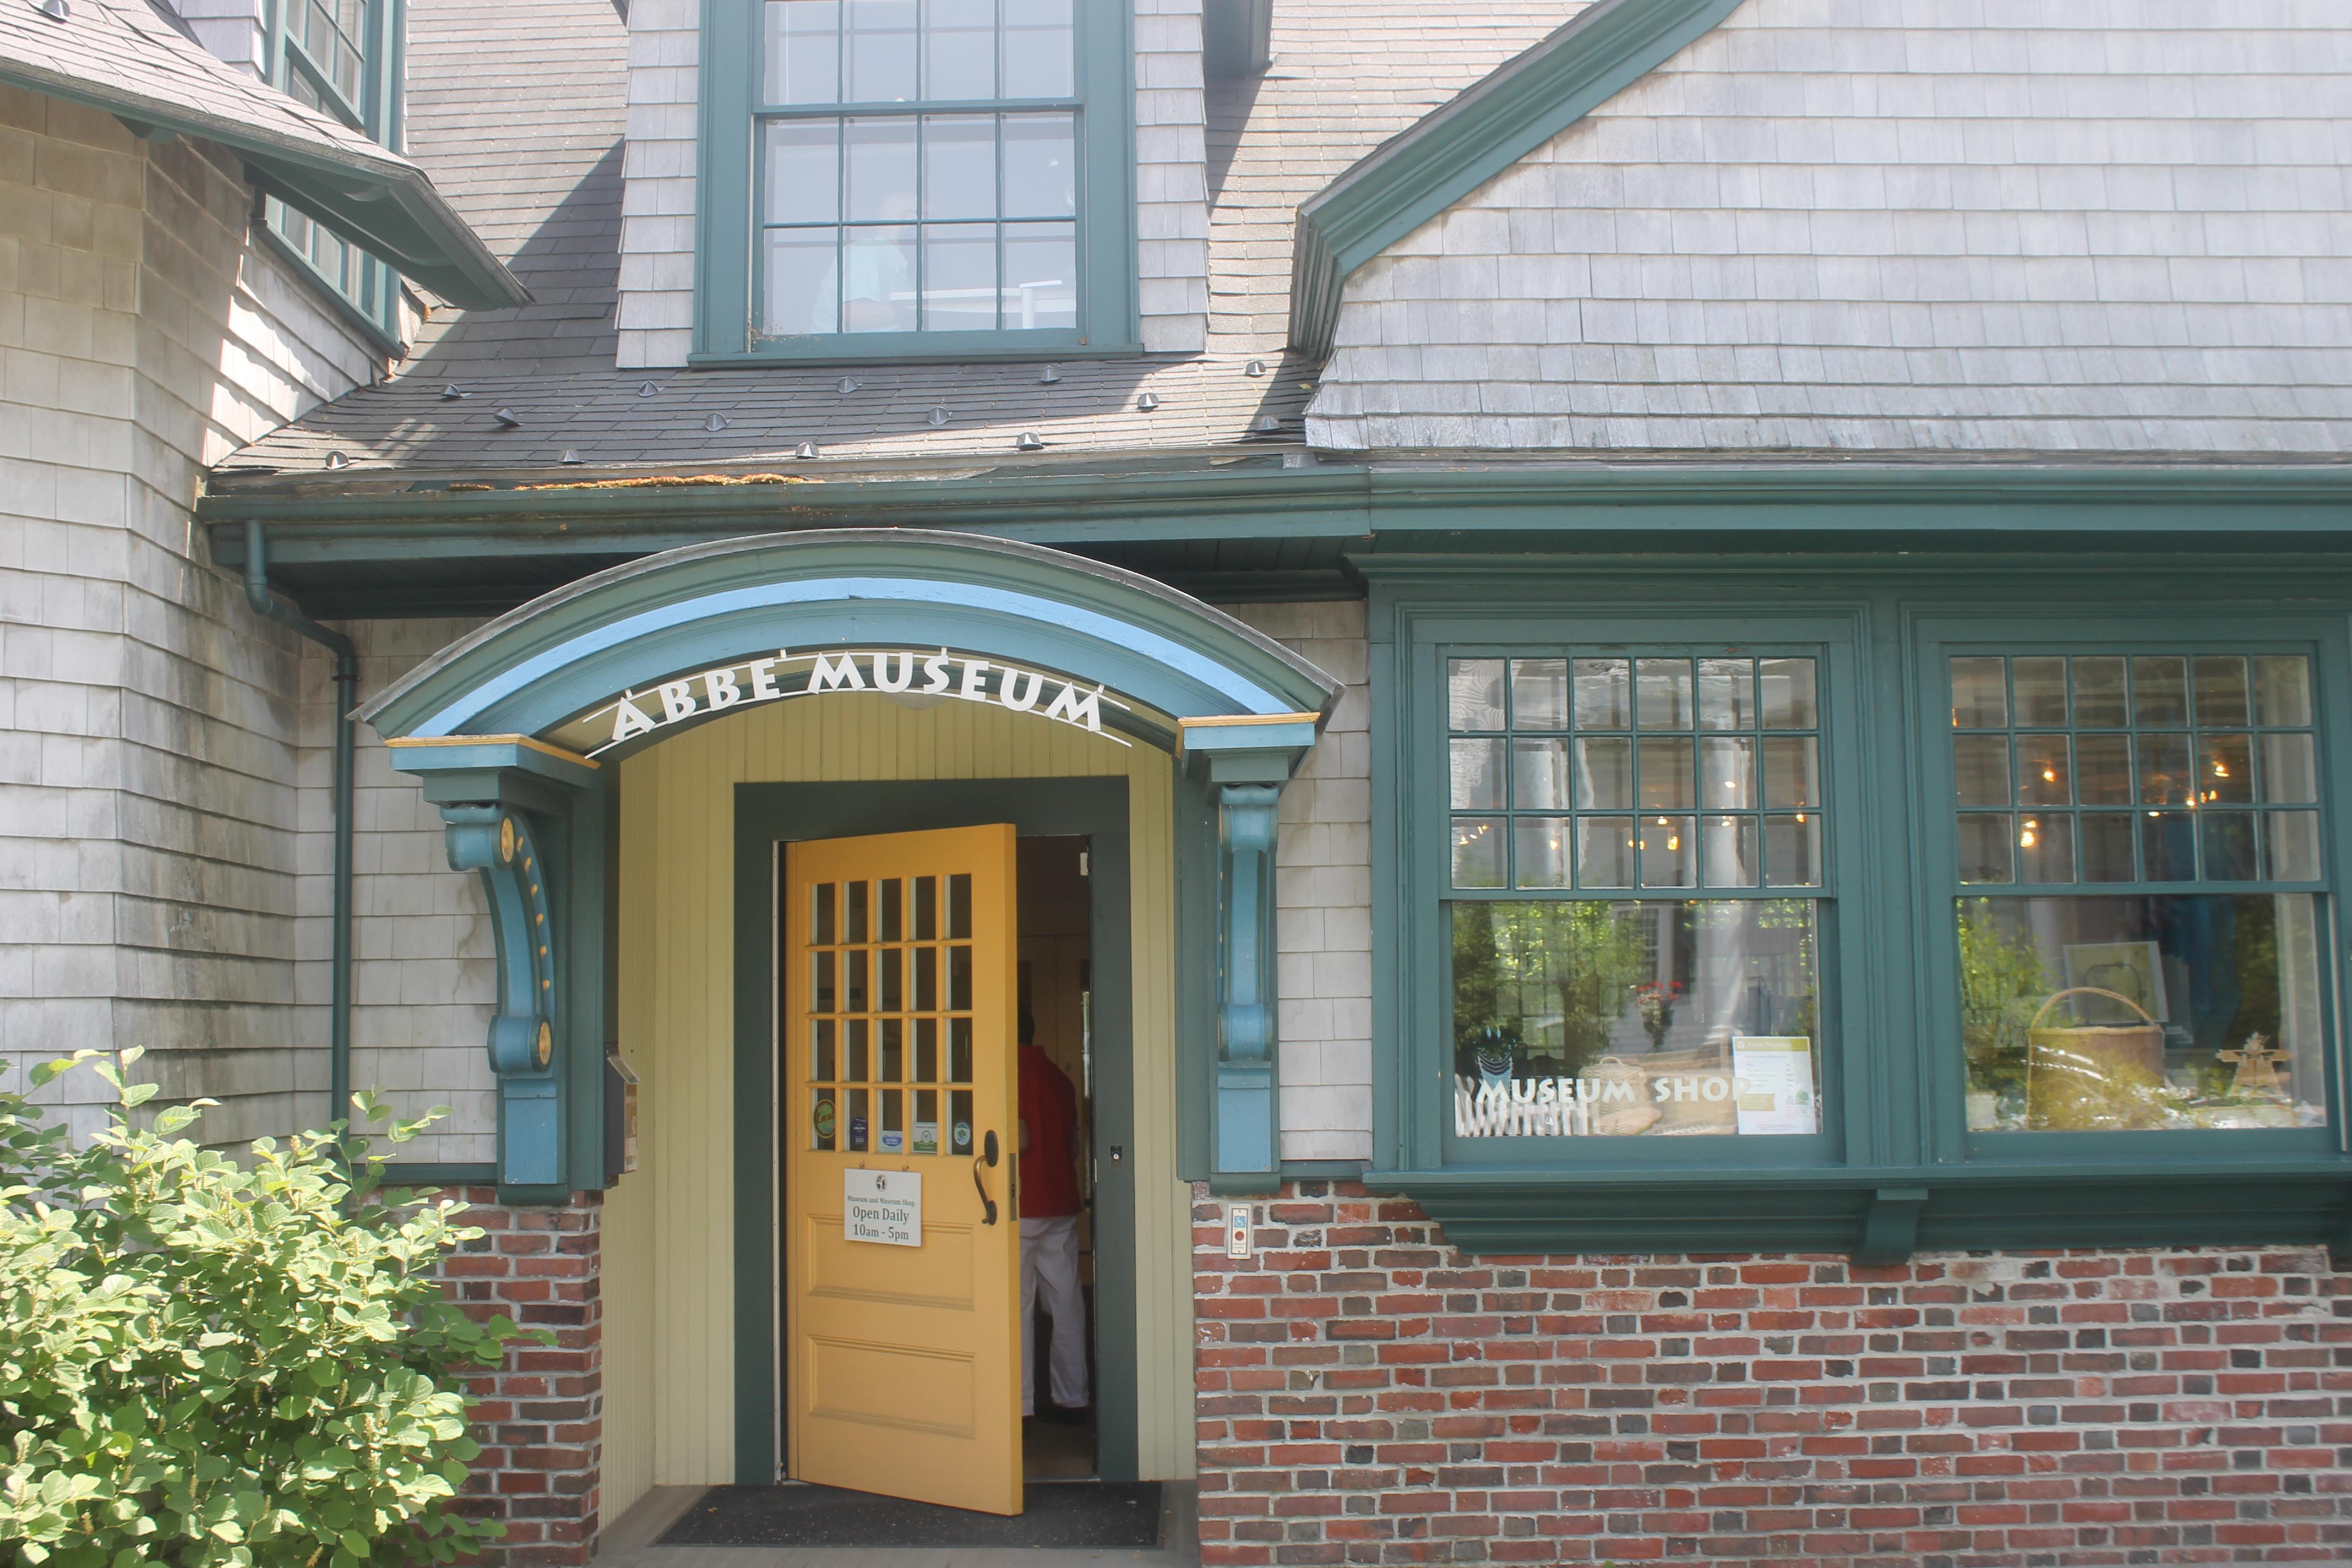 Abbe Museum, Bar Harbor, Me